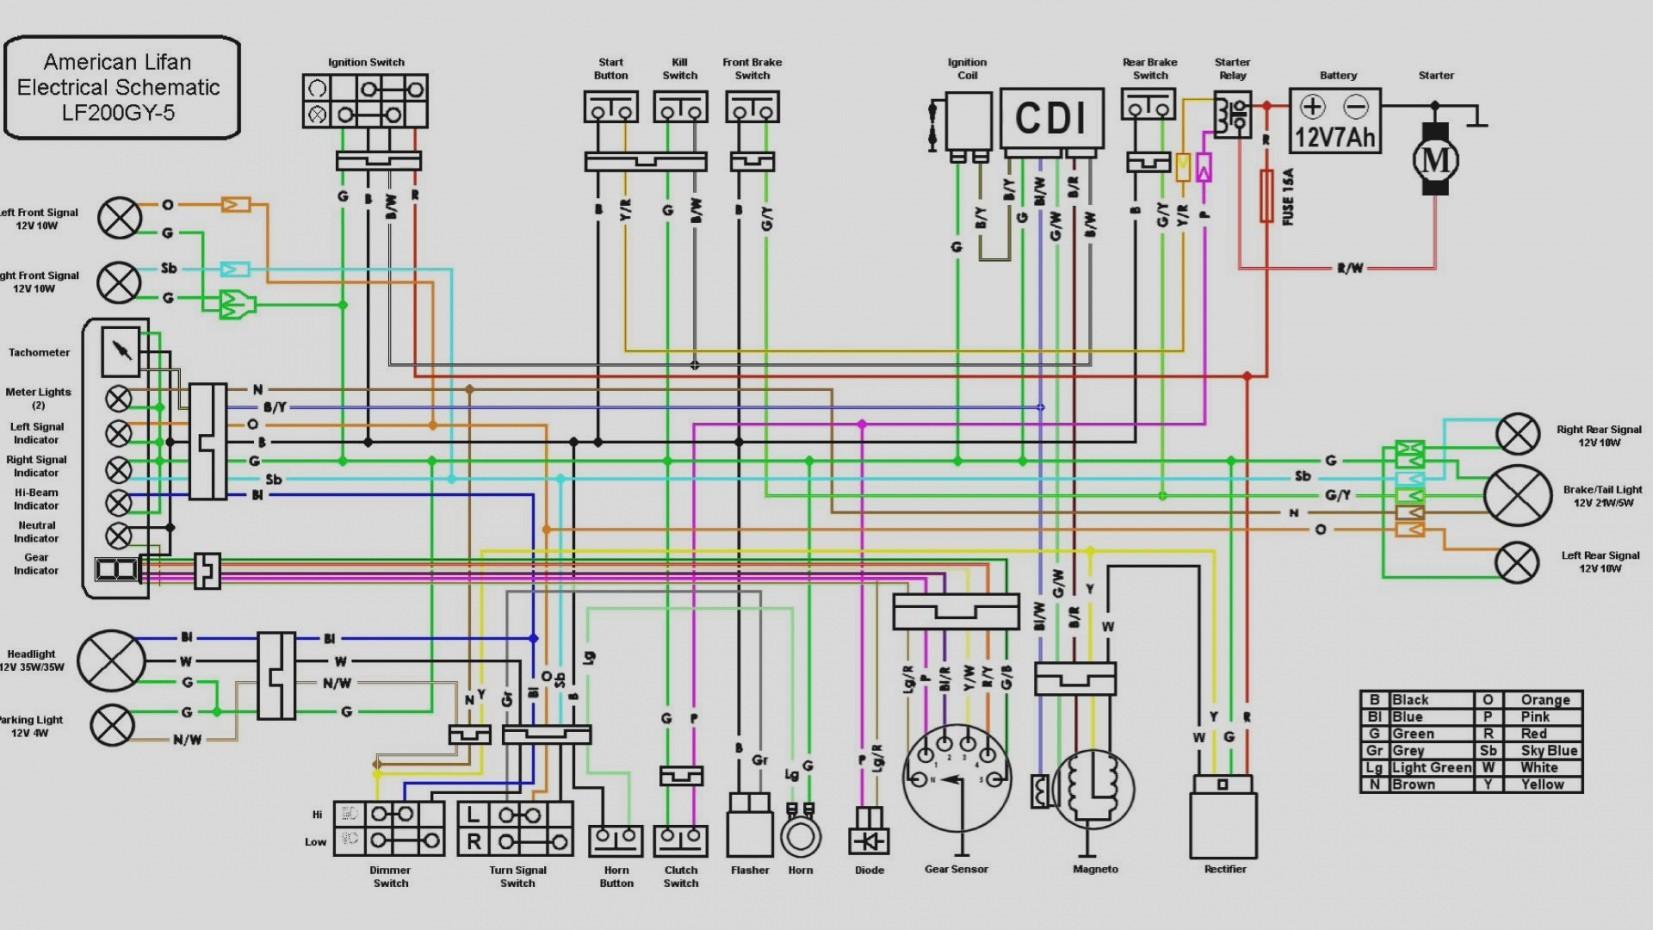 Full Size of Wiring Diagram Chinese Atv Wiring Diagram Unique Chinese 125cc Atv Wiring Diagram